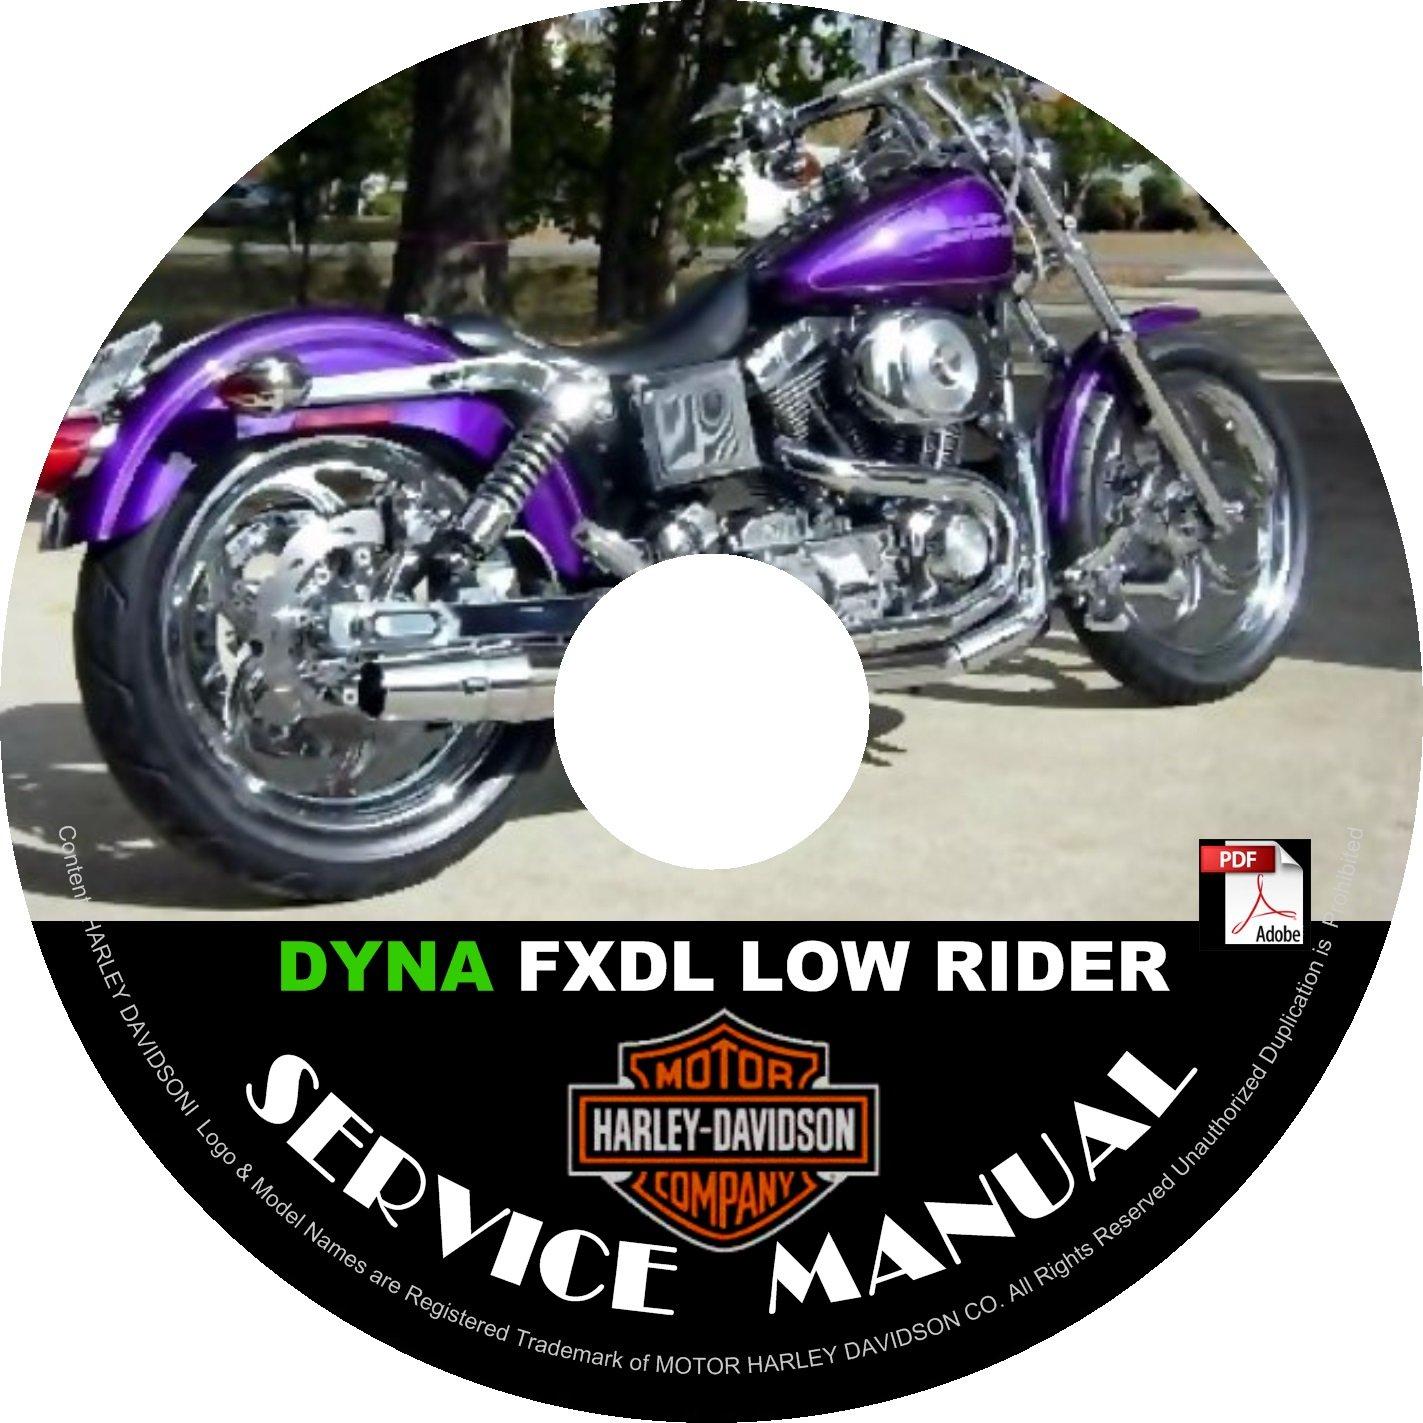 2000 Harley Davidson FXDL Dyna Low Rider Service Repair Shop Manual on CD Fix Rebuild '00 Workshop